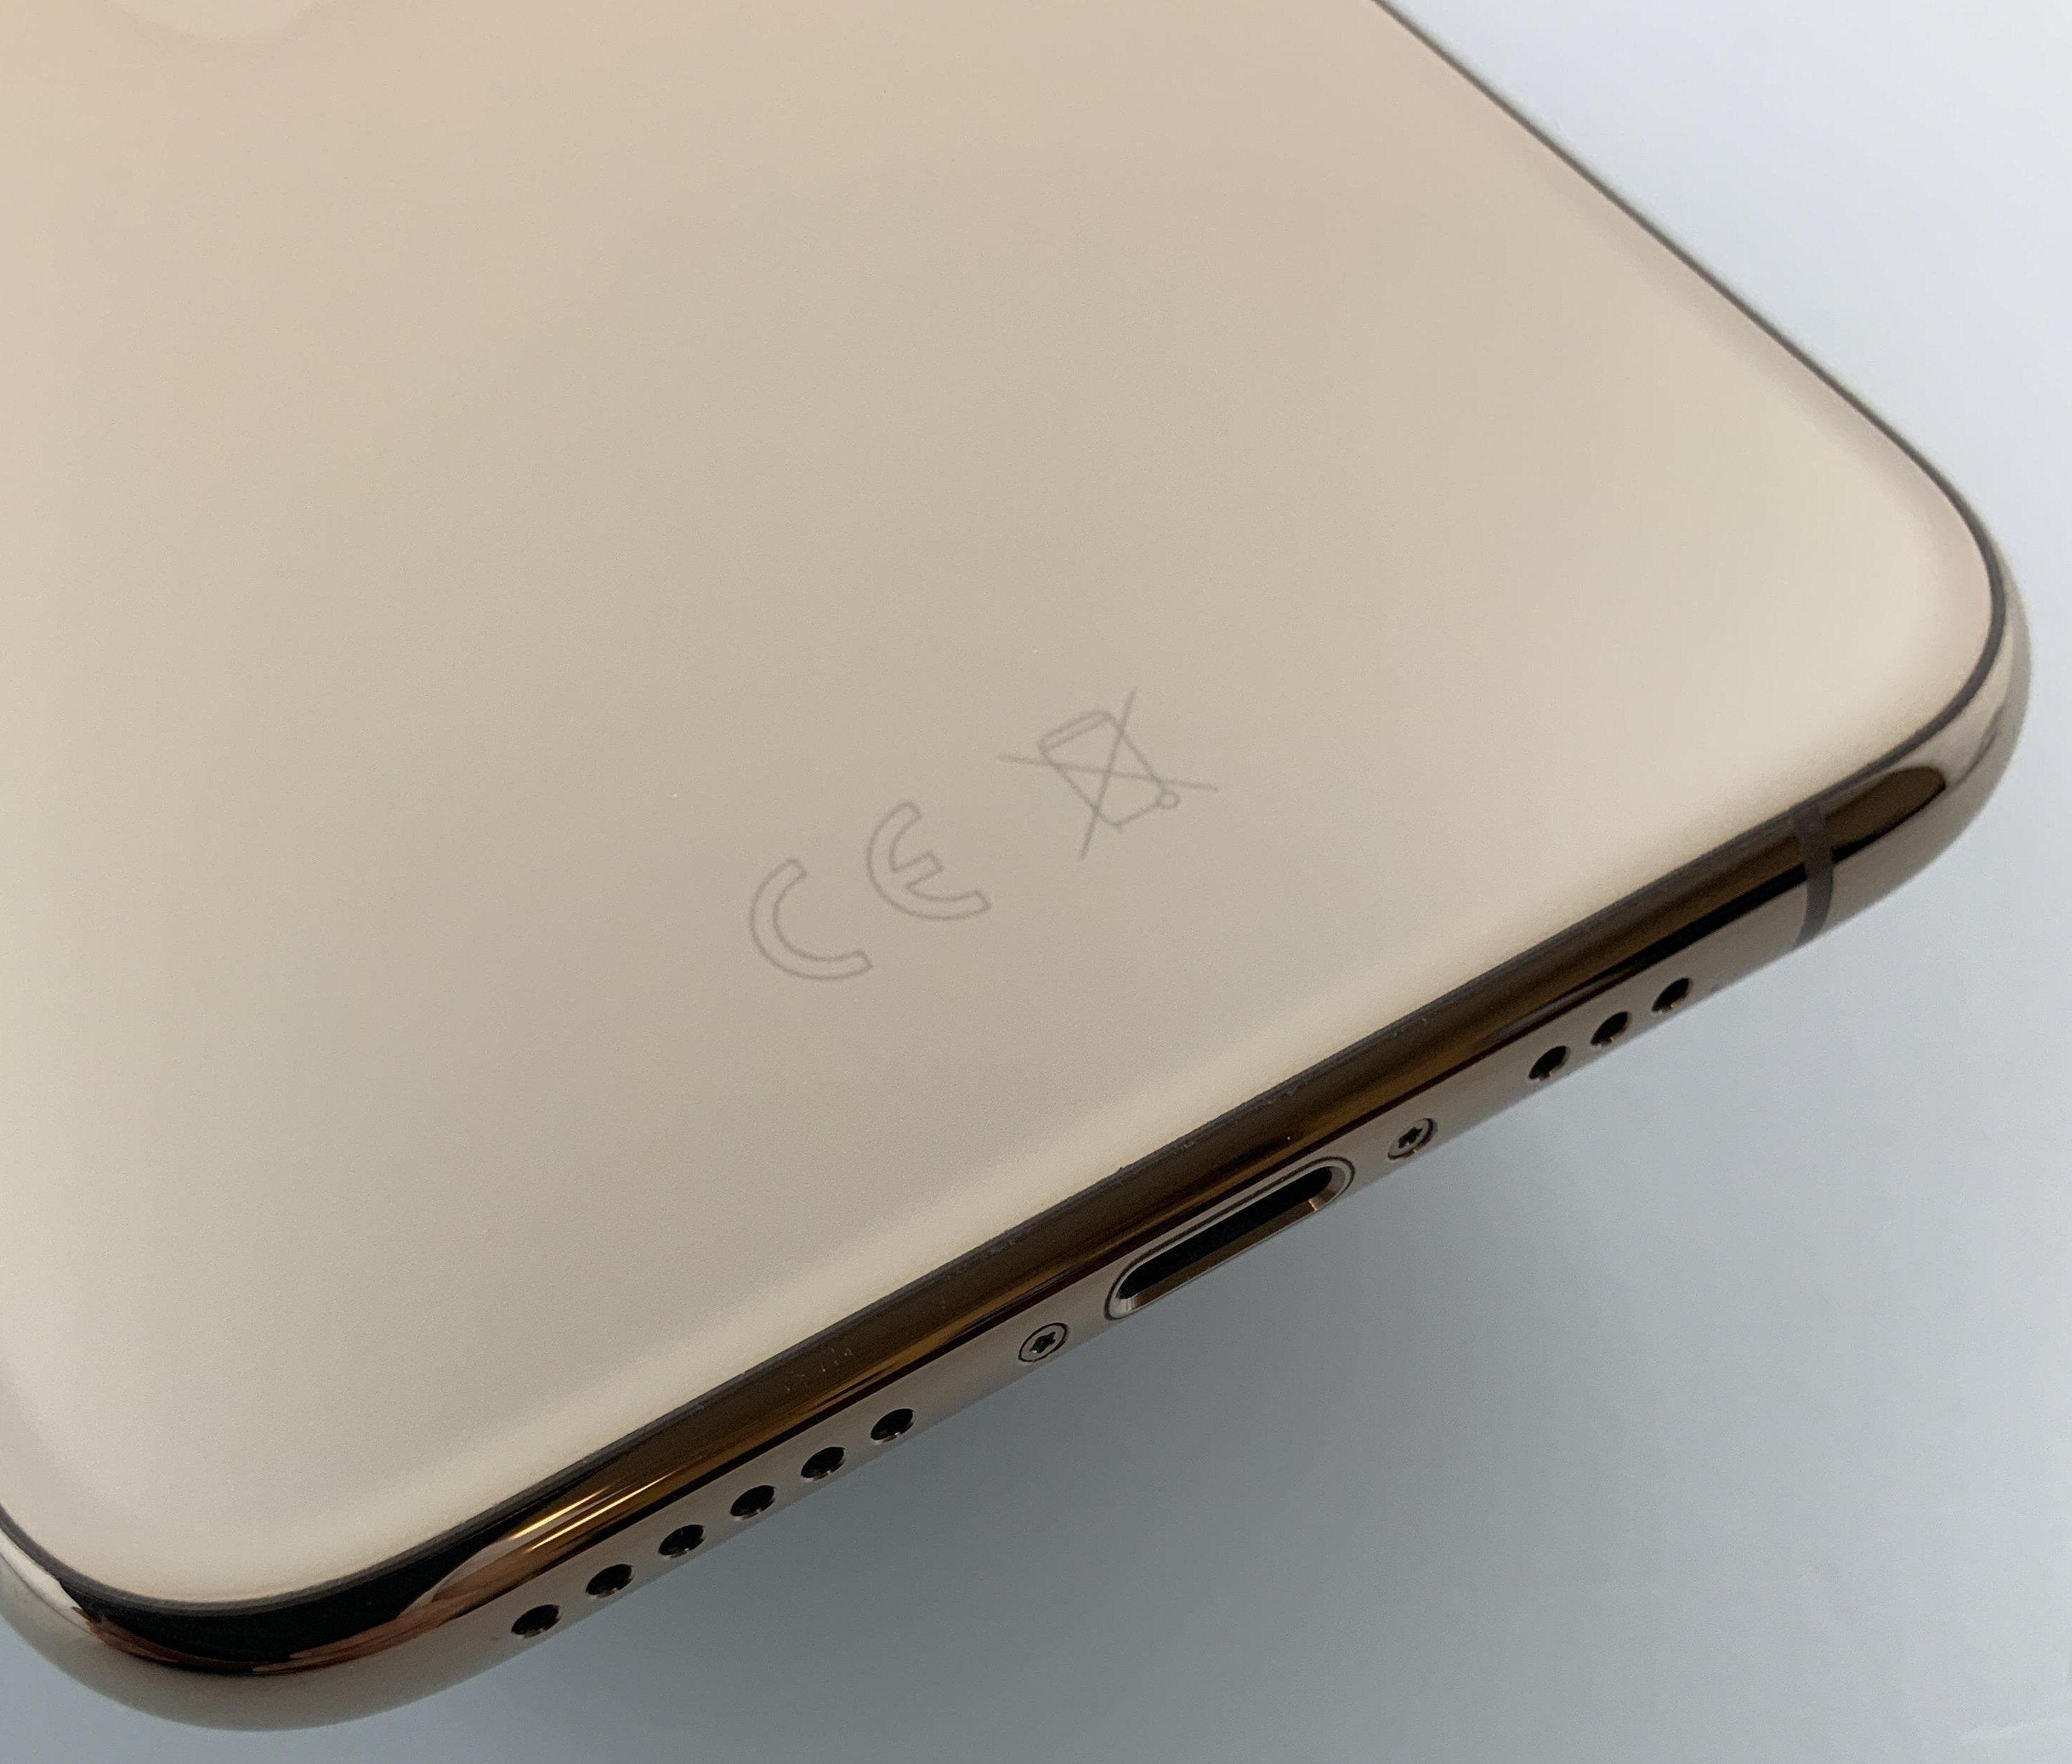 iPhone 11 Pro 256GB, 256GB, Gold, immagine 3